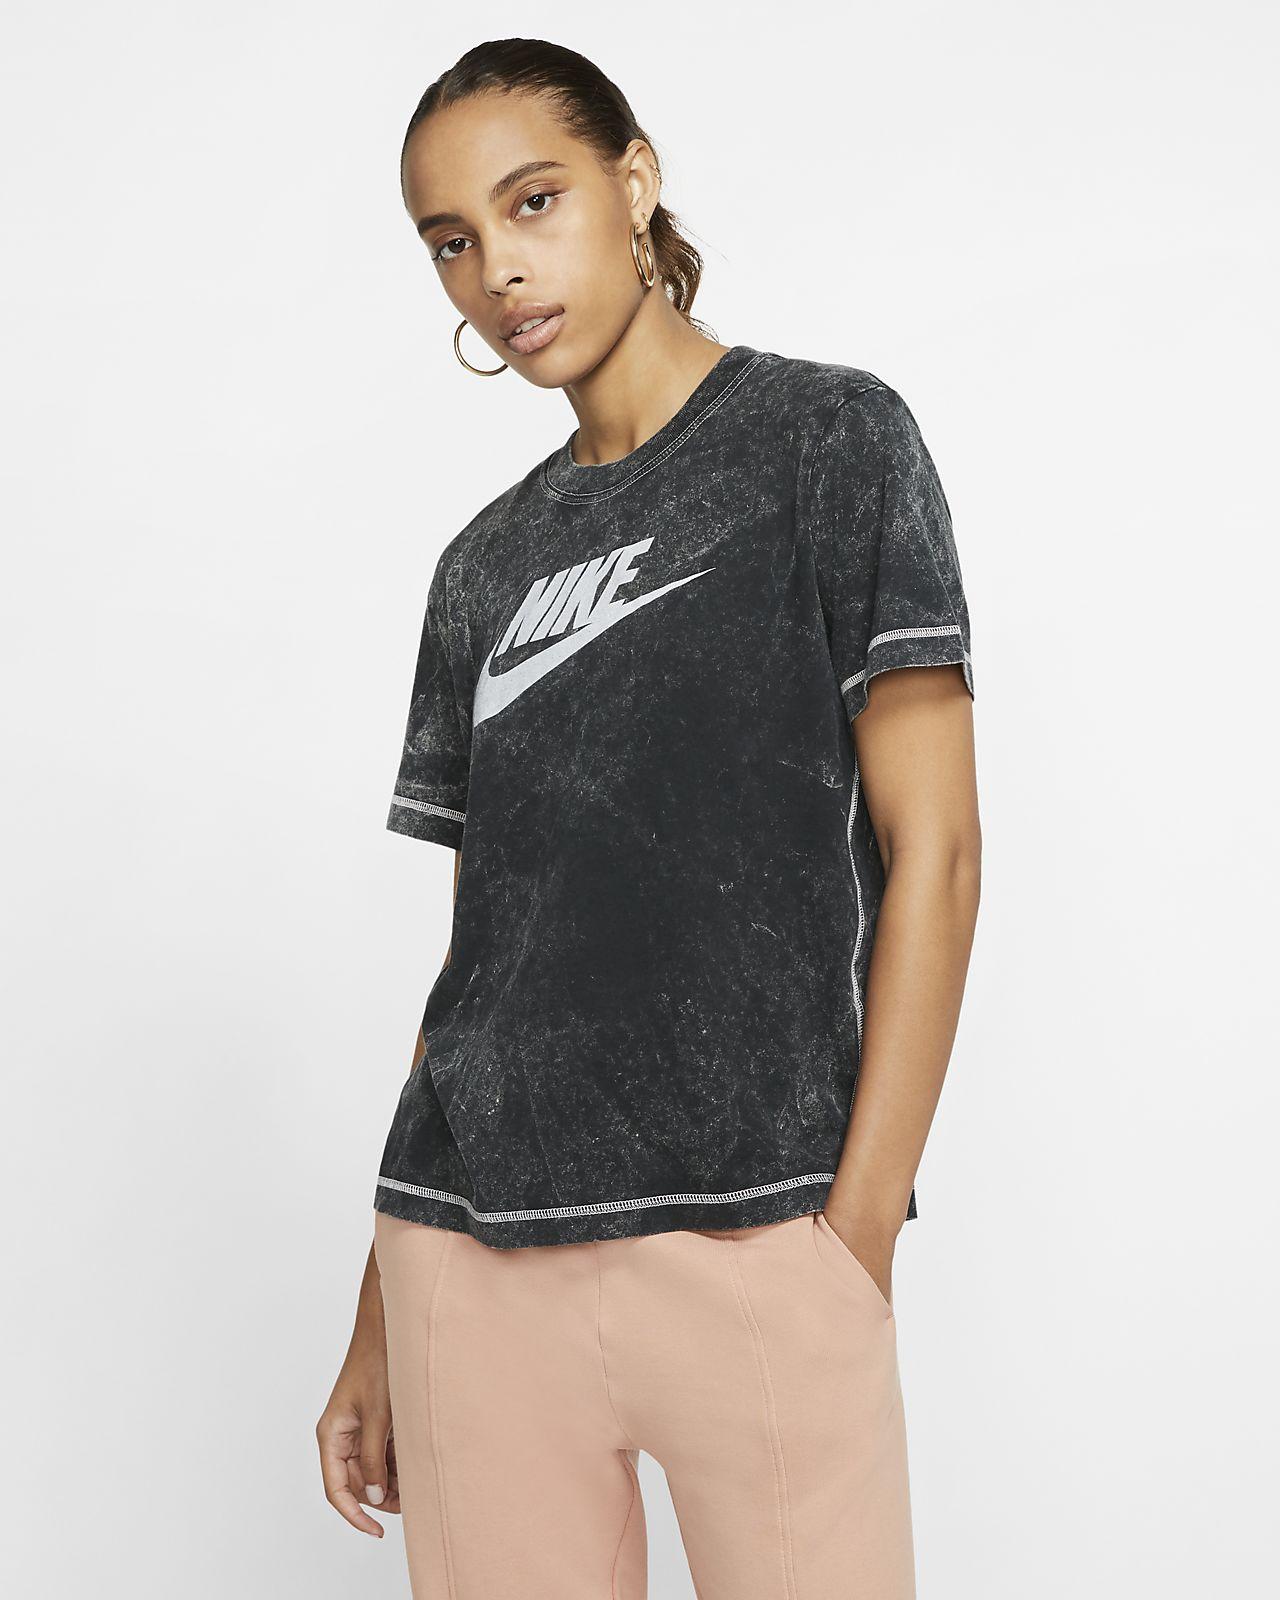 Prenda para la parte superior de manga corta para mujer Nike Sportswear